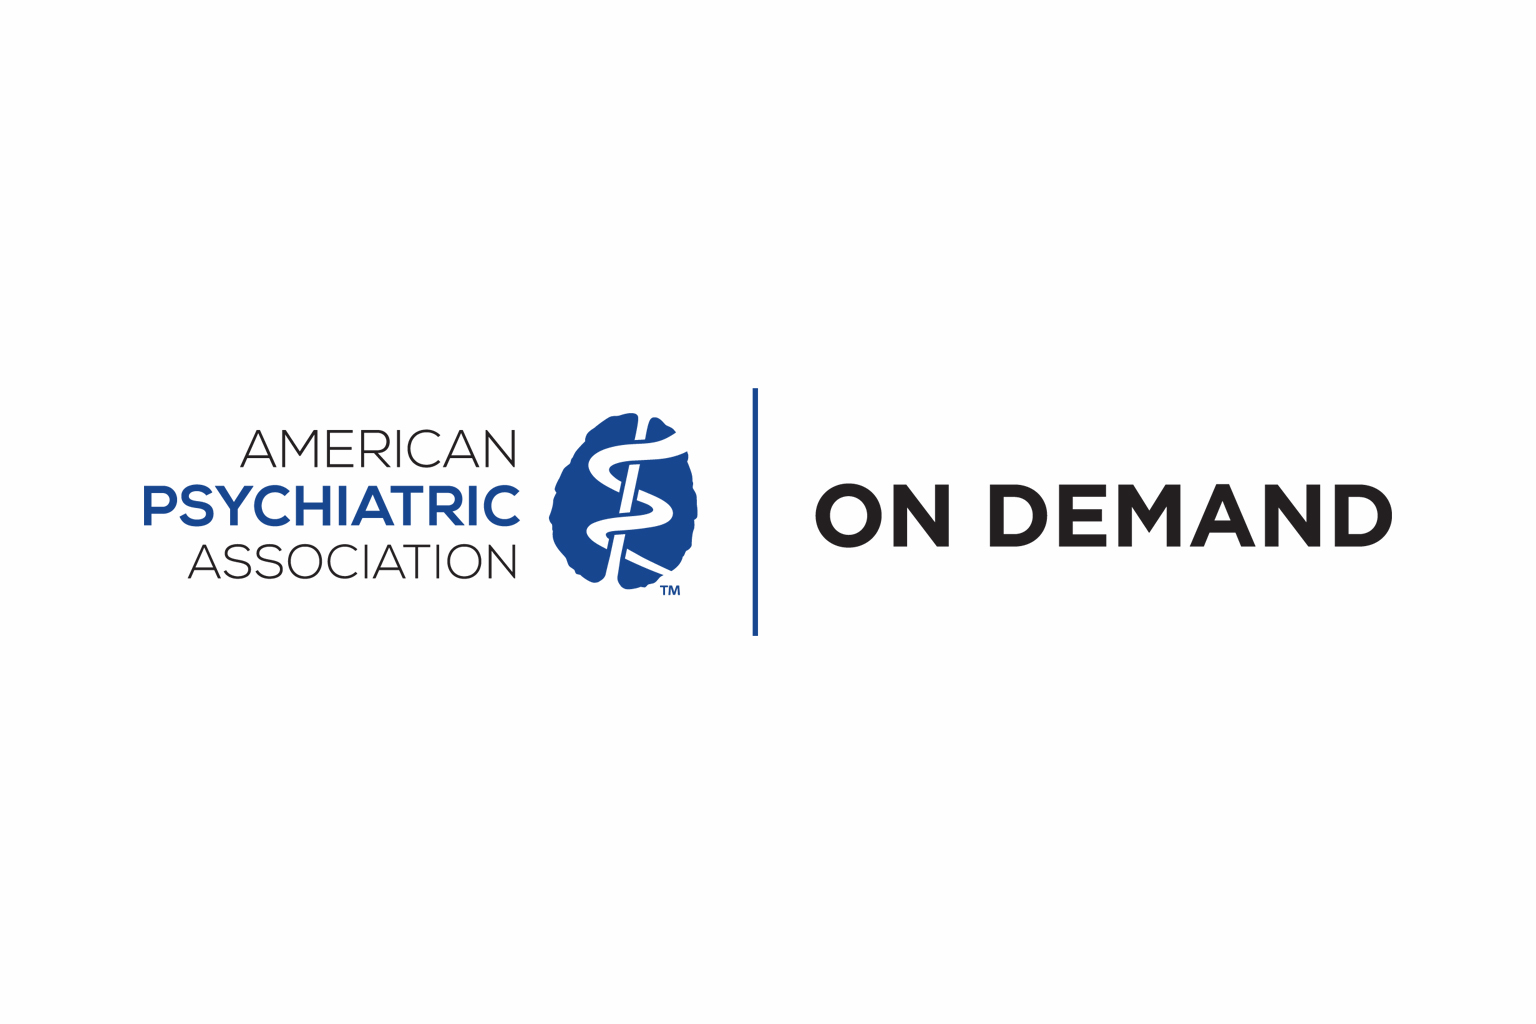 American Psychiatric Association OnDemand logo